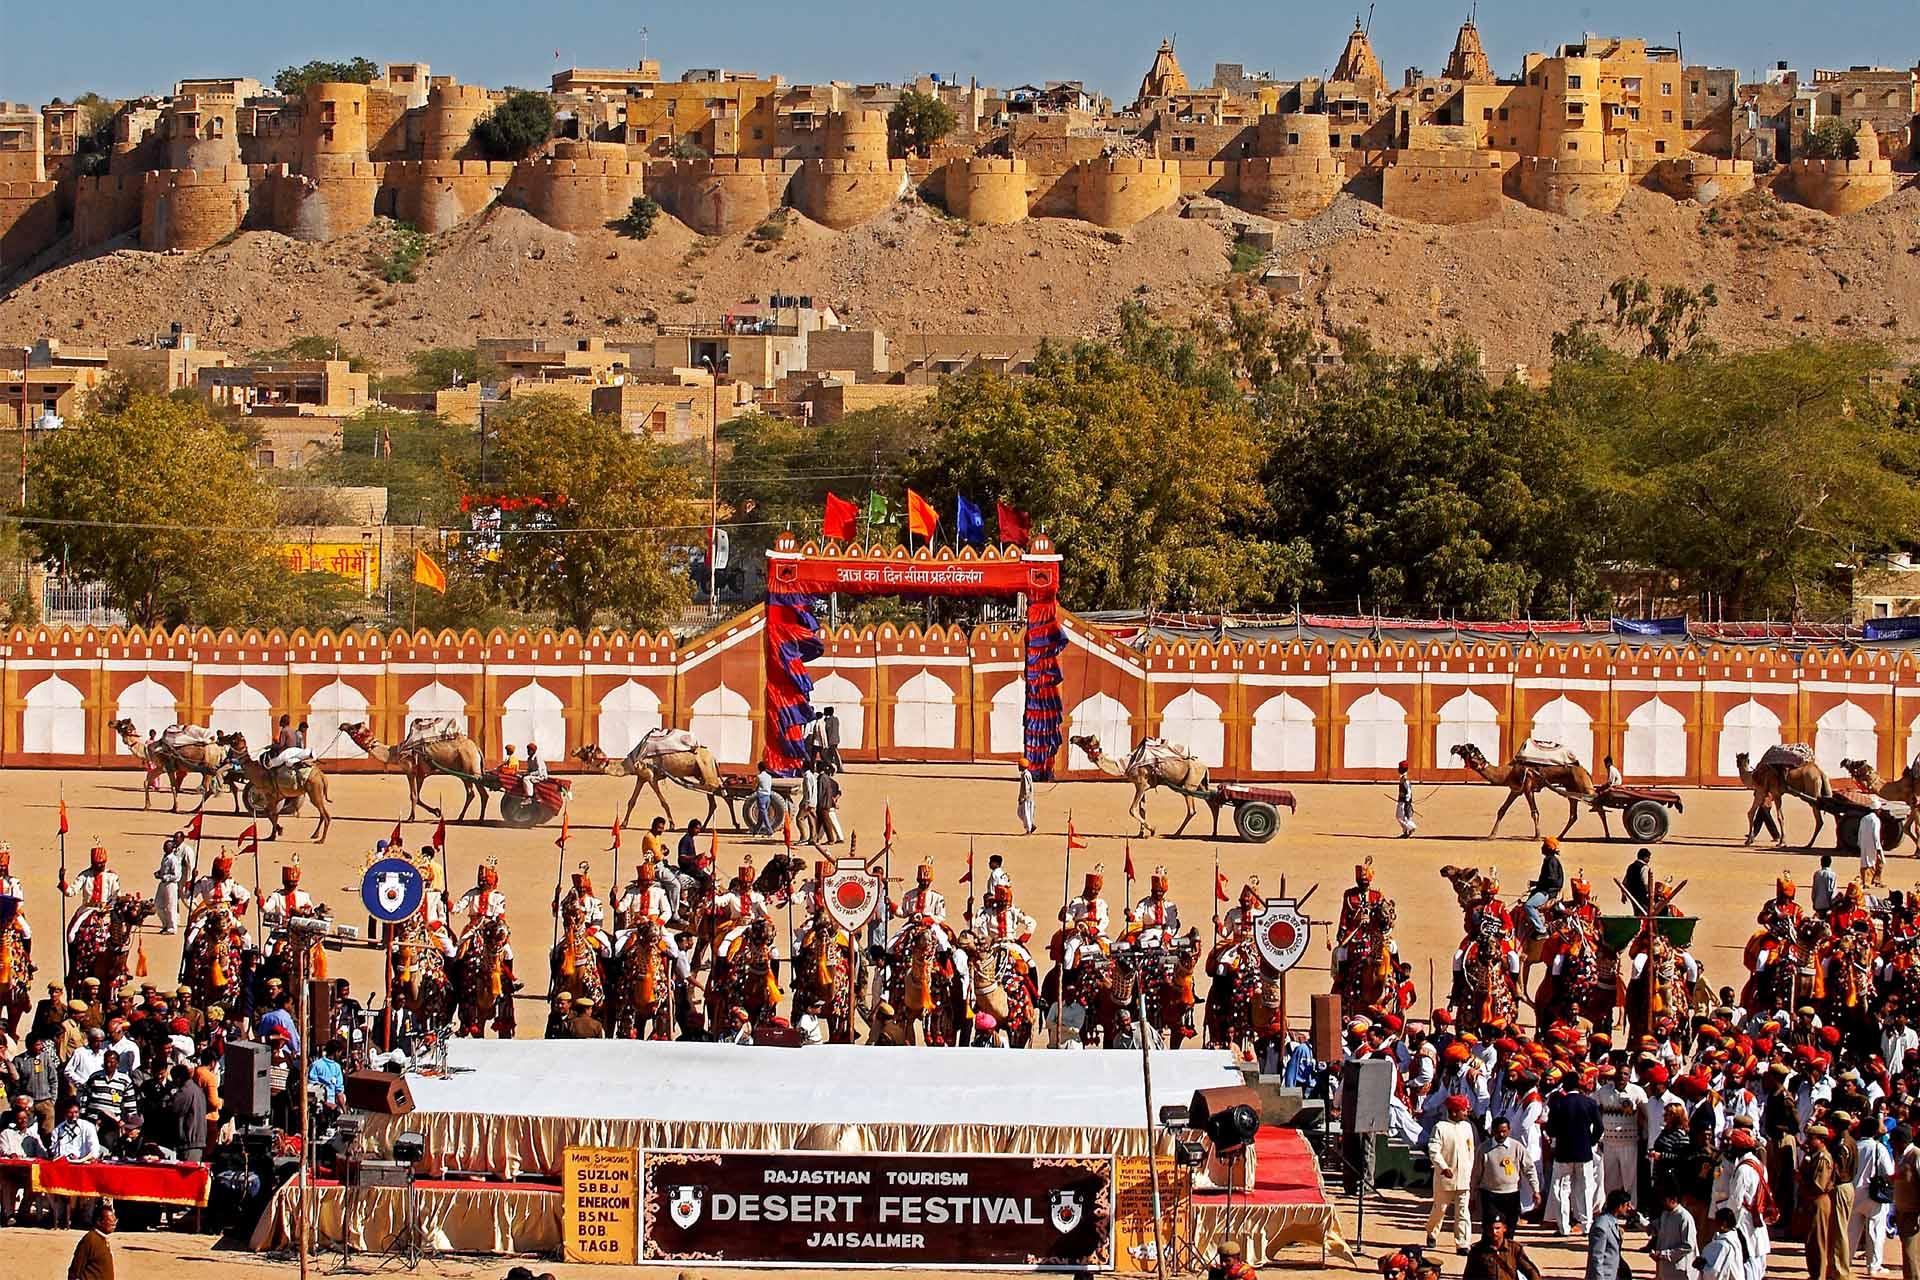 Desert-Festival-of-Jaisalmer Festivales más Famosos de la India